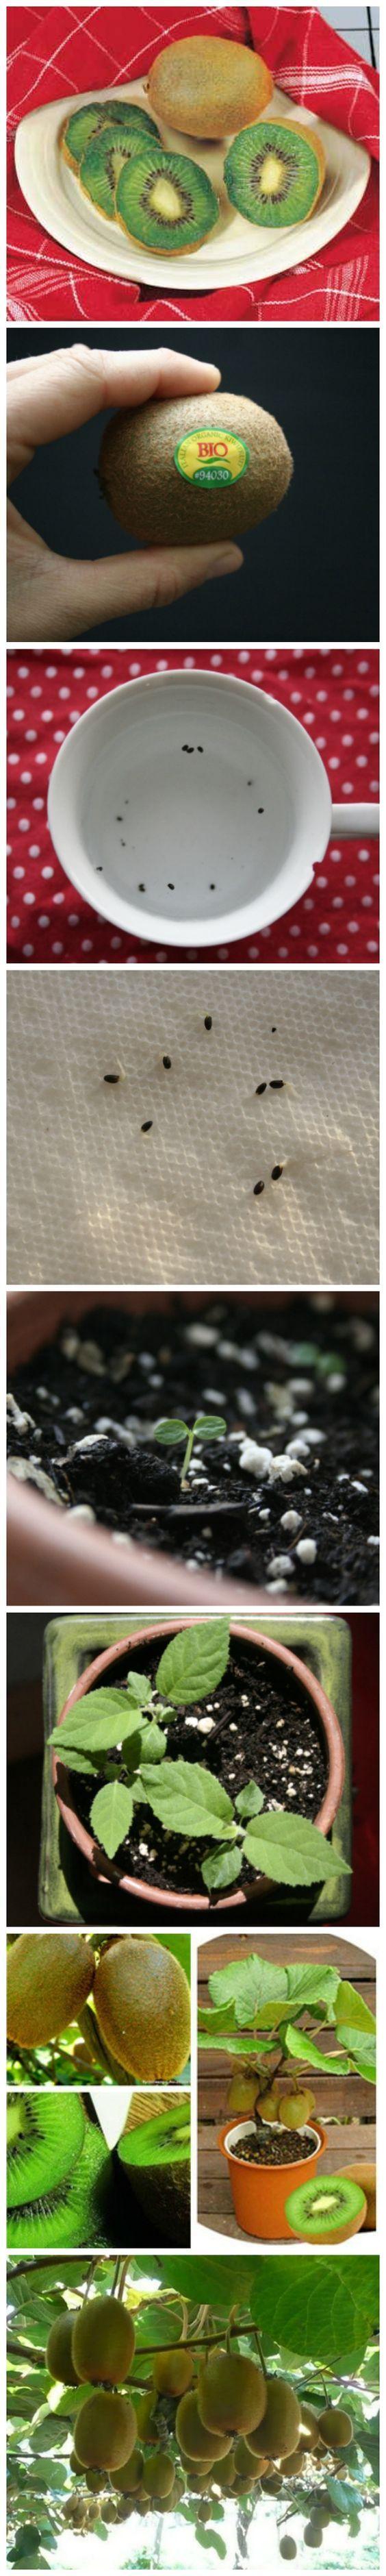 Kiwi selbst anpflanzen - ganz leicht - step by step Anleitung *** How to grow your own Kiwi